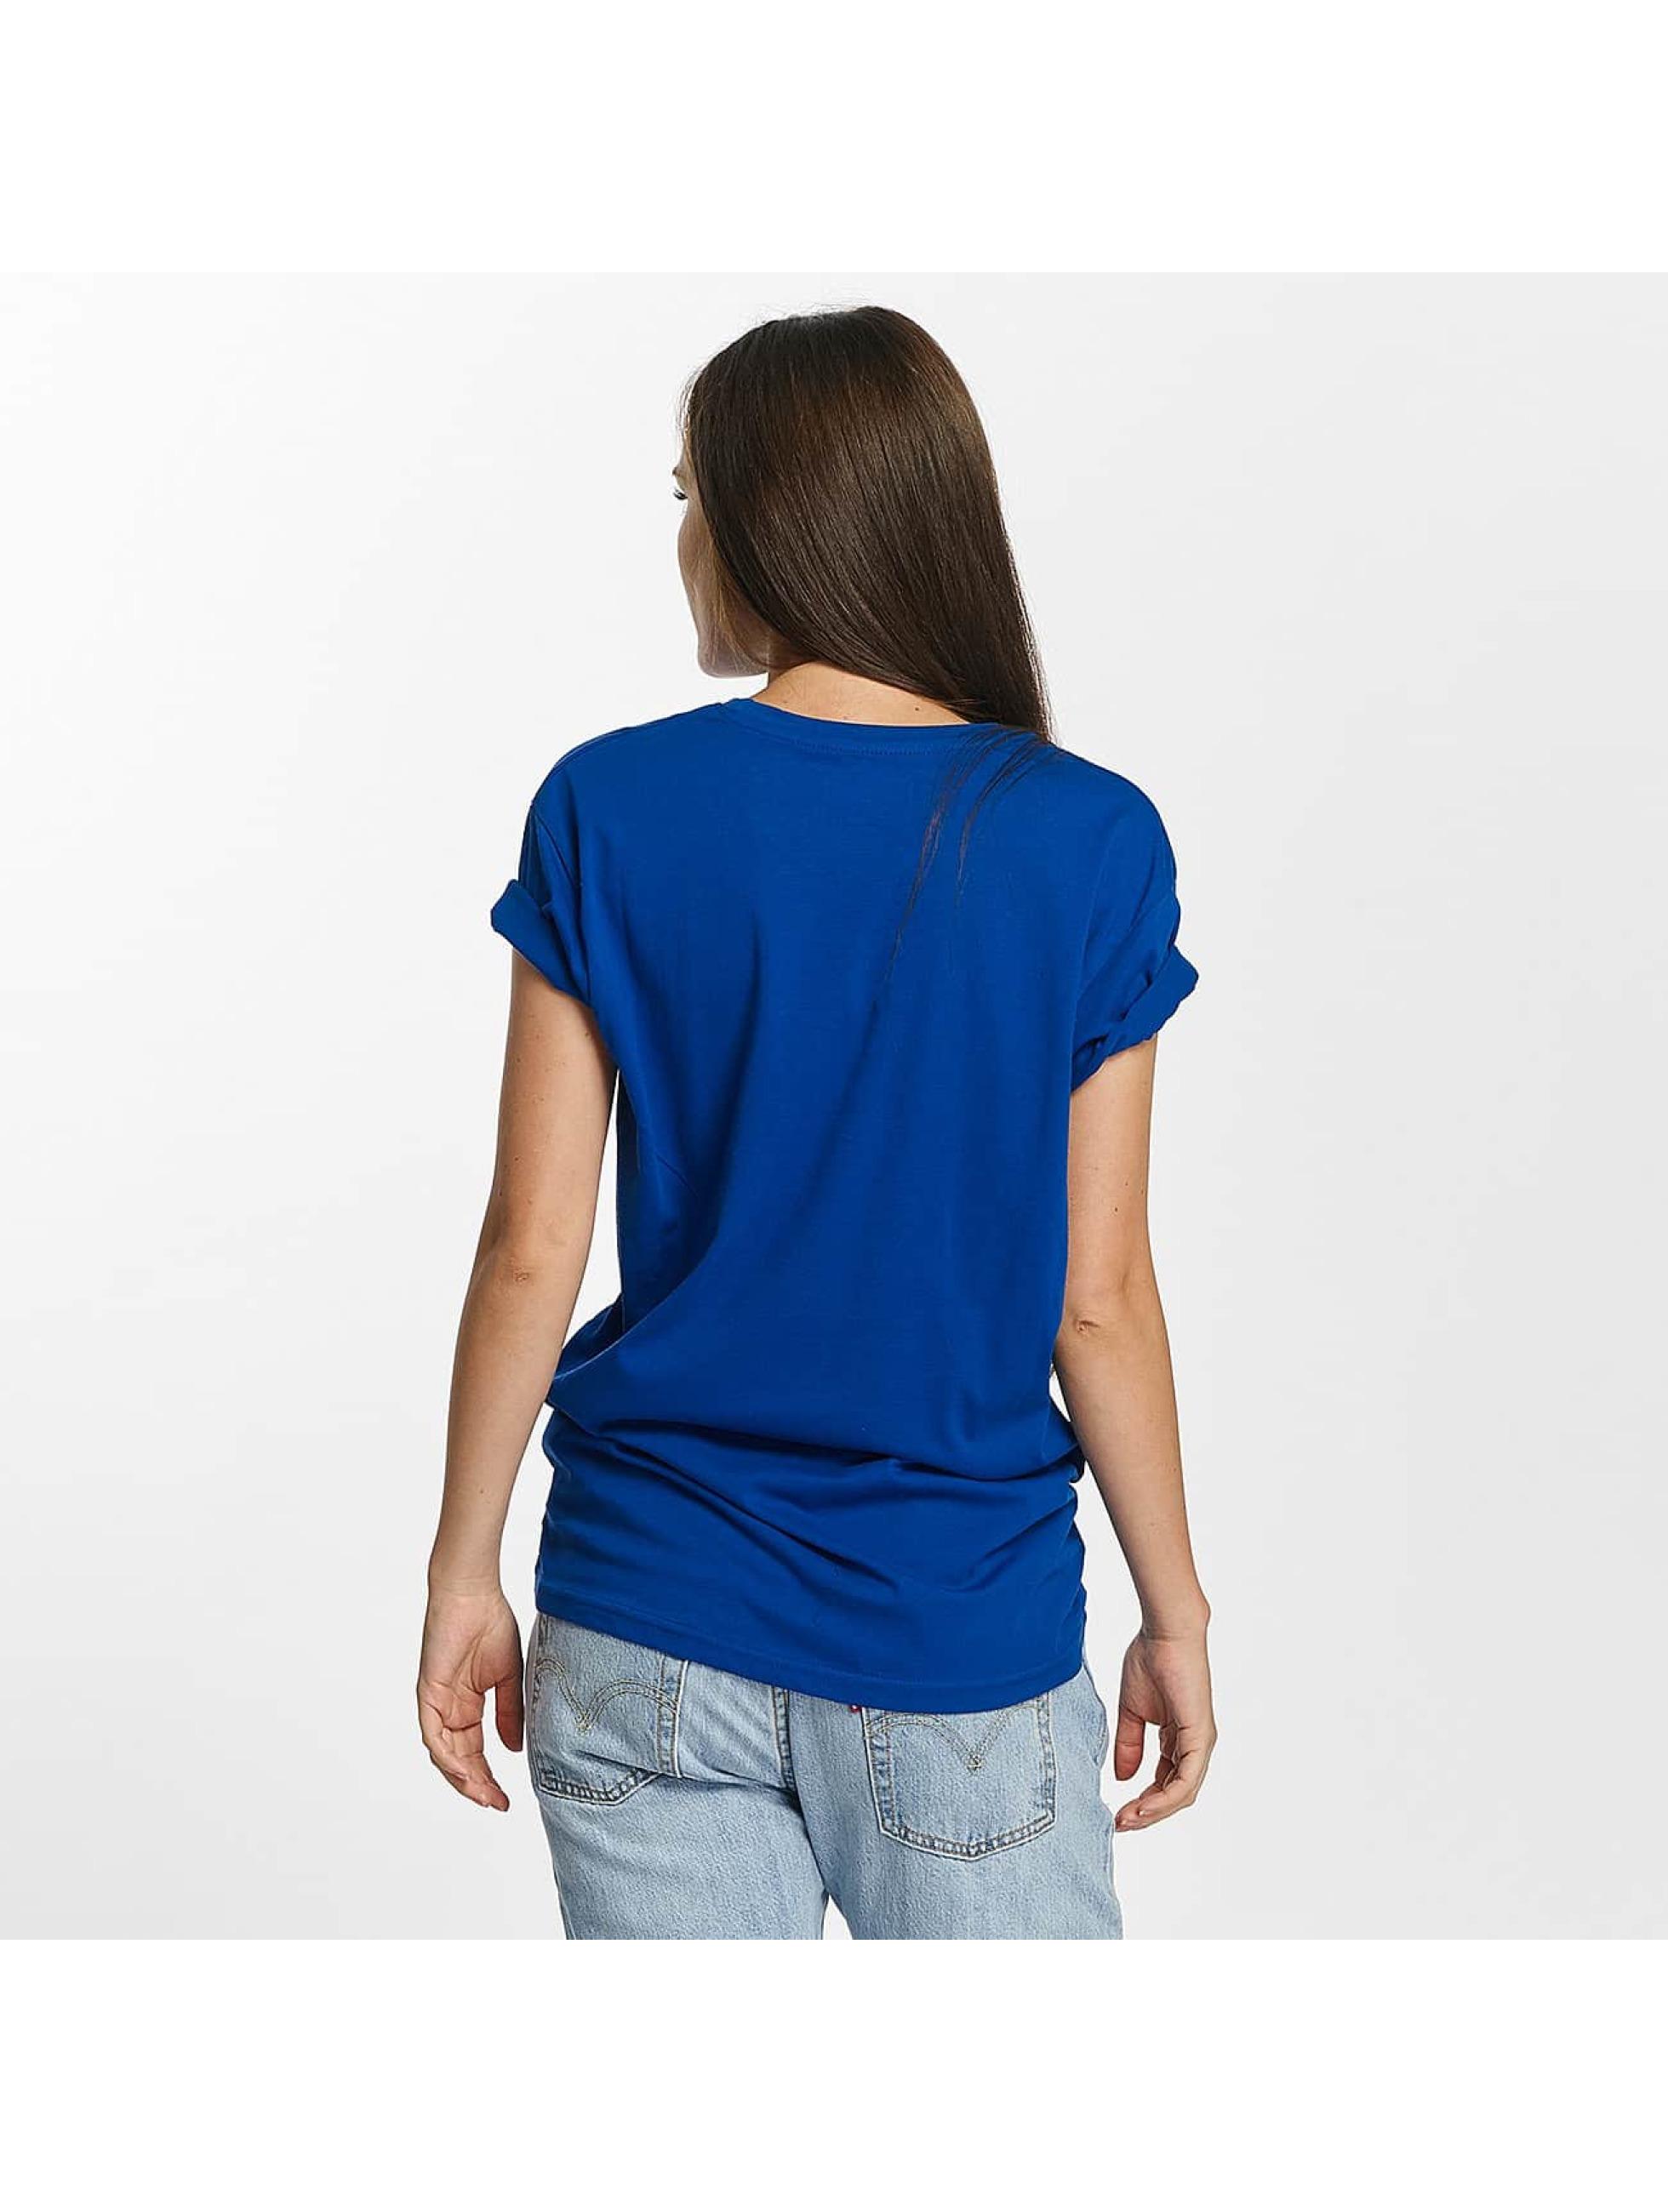 Cyprime T-Shirt Platinum Oversized blau